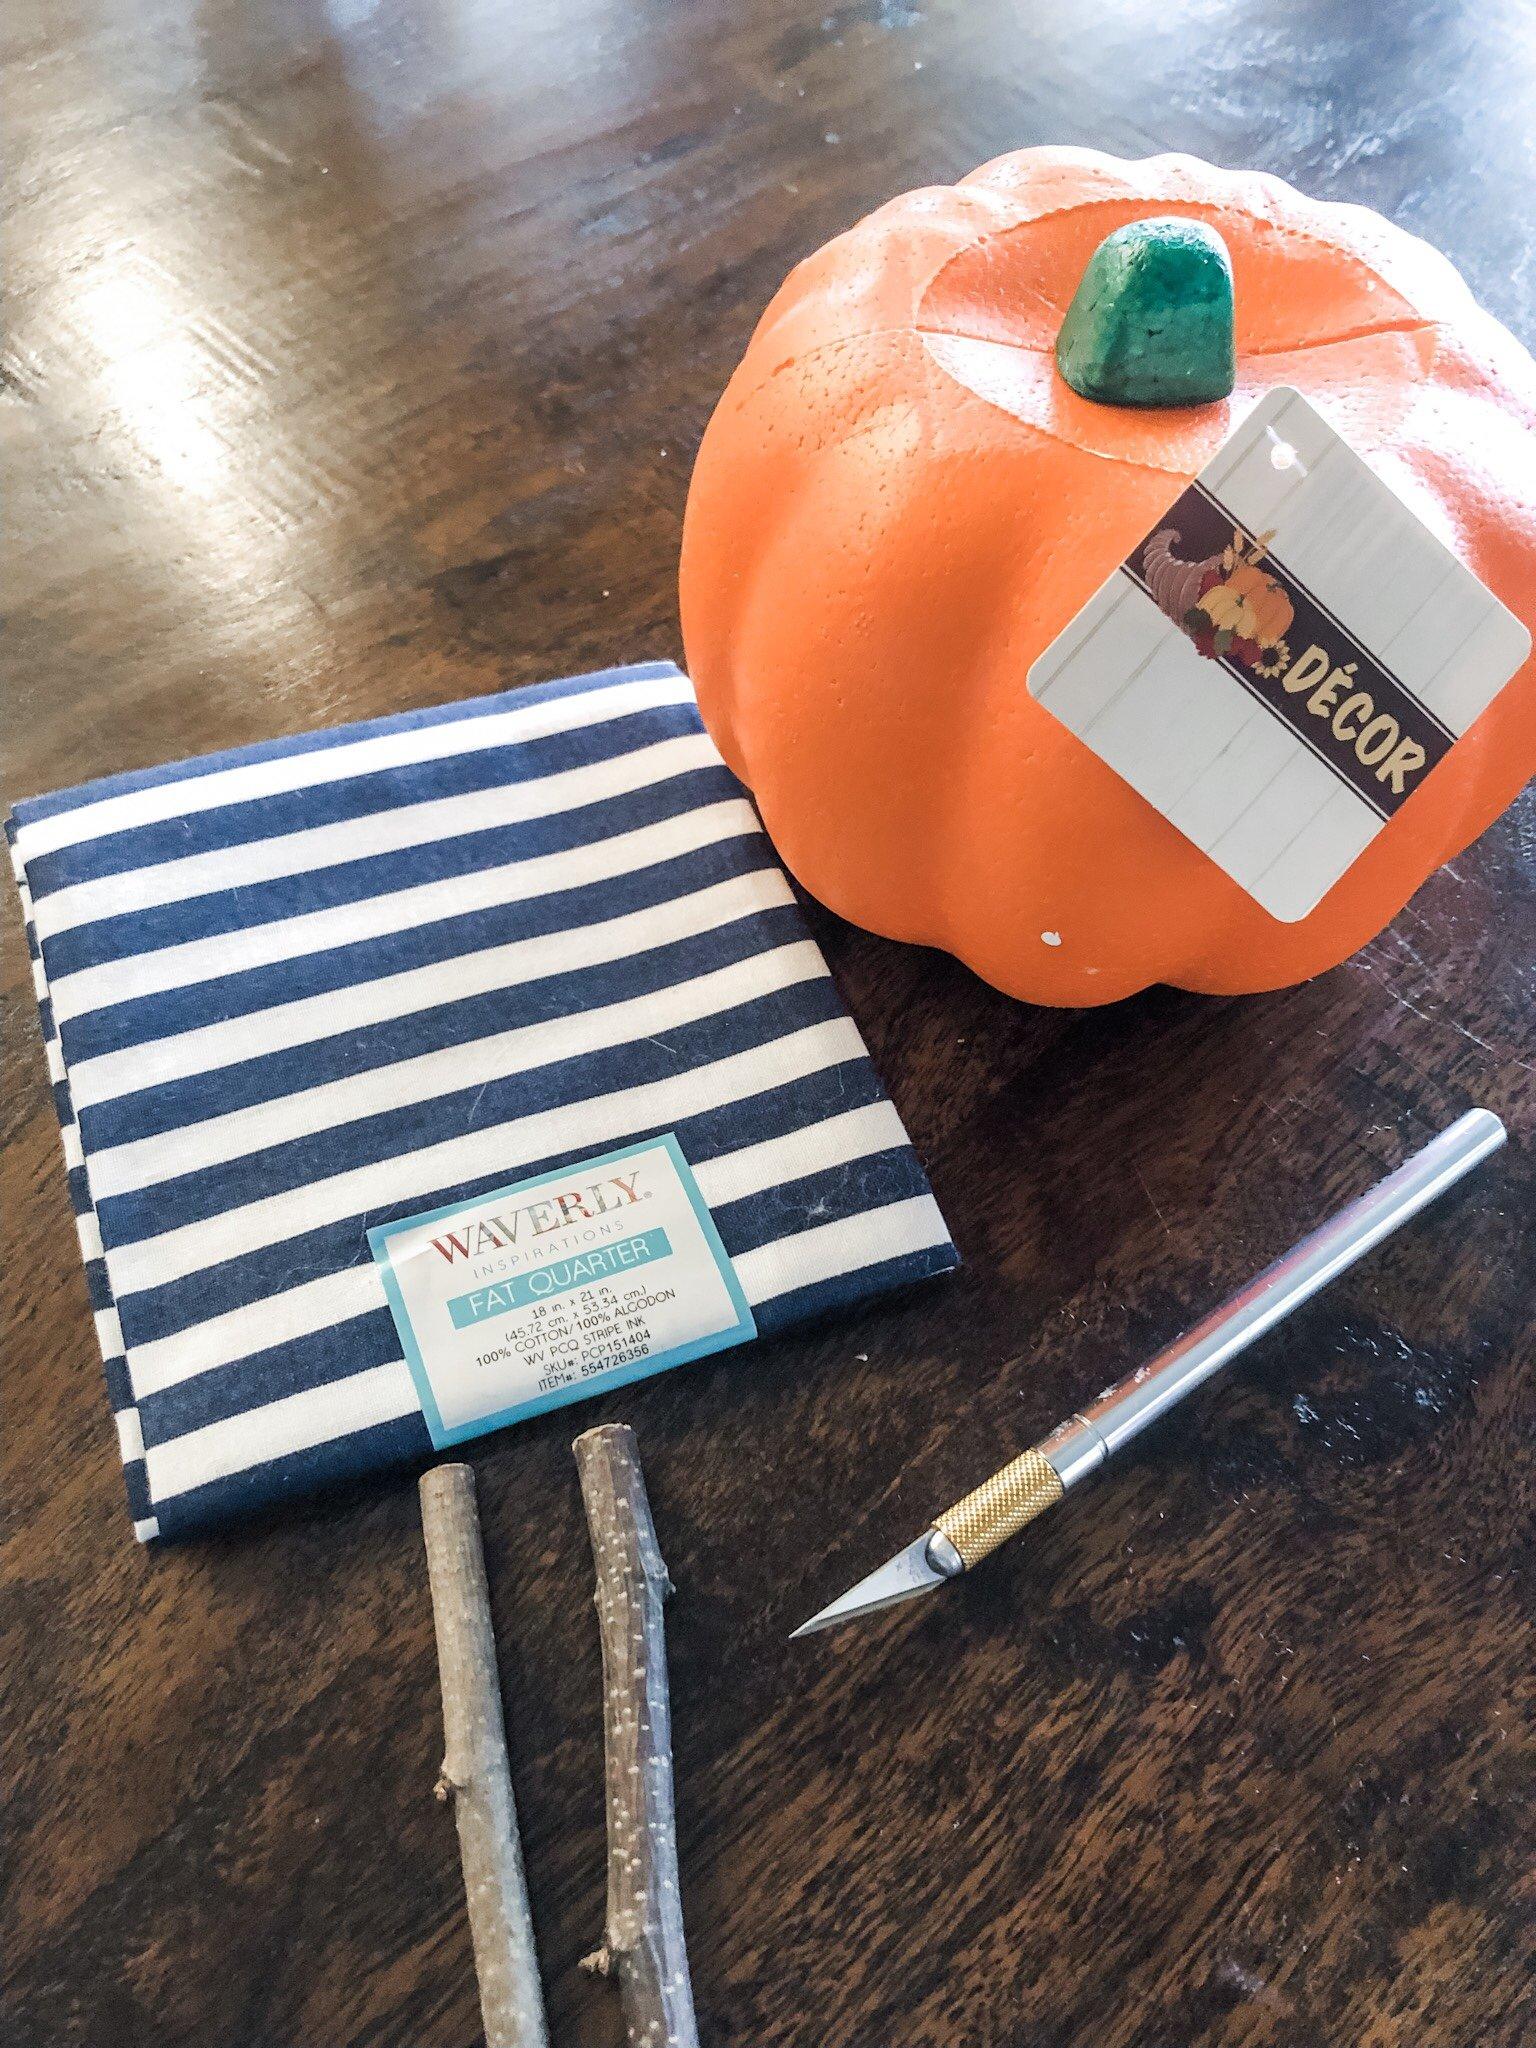 Easy no sew fabric pumpkins from dollar tree pumpkins and fat quarter fabric